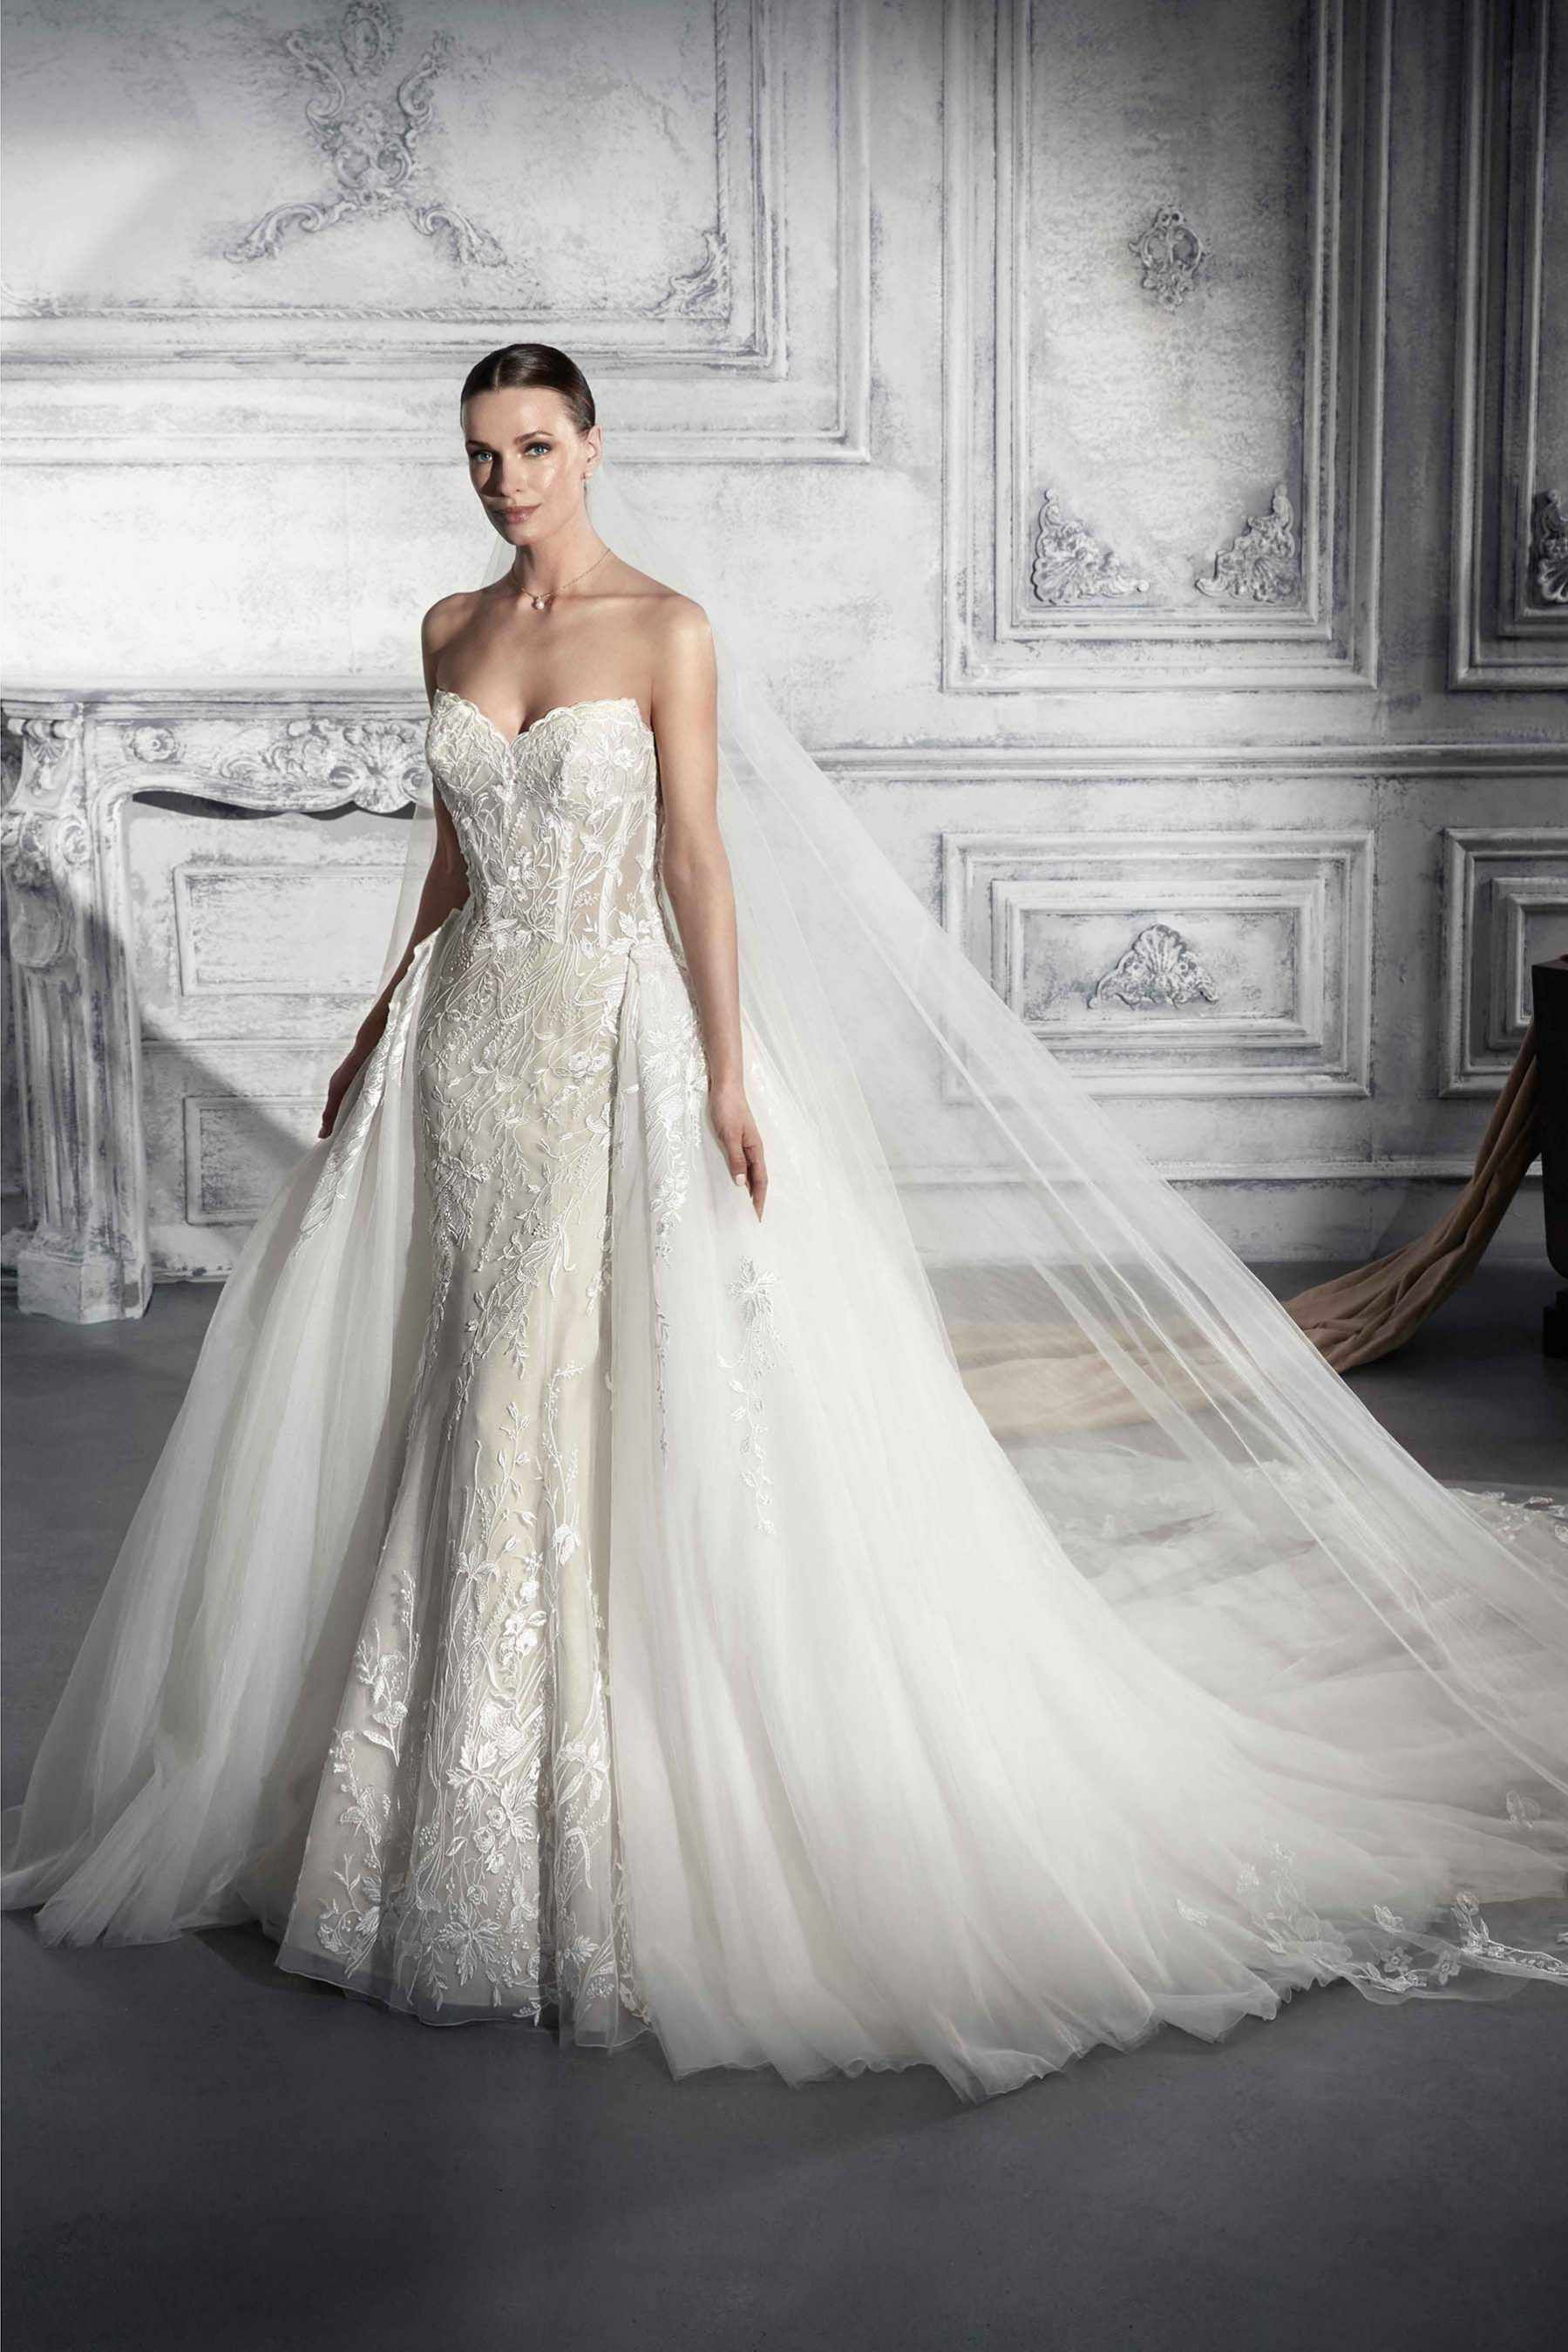 Demetrios Wedding Dress Style 773 A Mermaid Design That Flows Effortlessly From Bodice To Hem With R Wedding Dresses Ball Gowns Wedding Demetrios Wedding Dress [ 2698 x 1799 Pixel ]